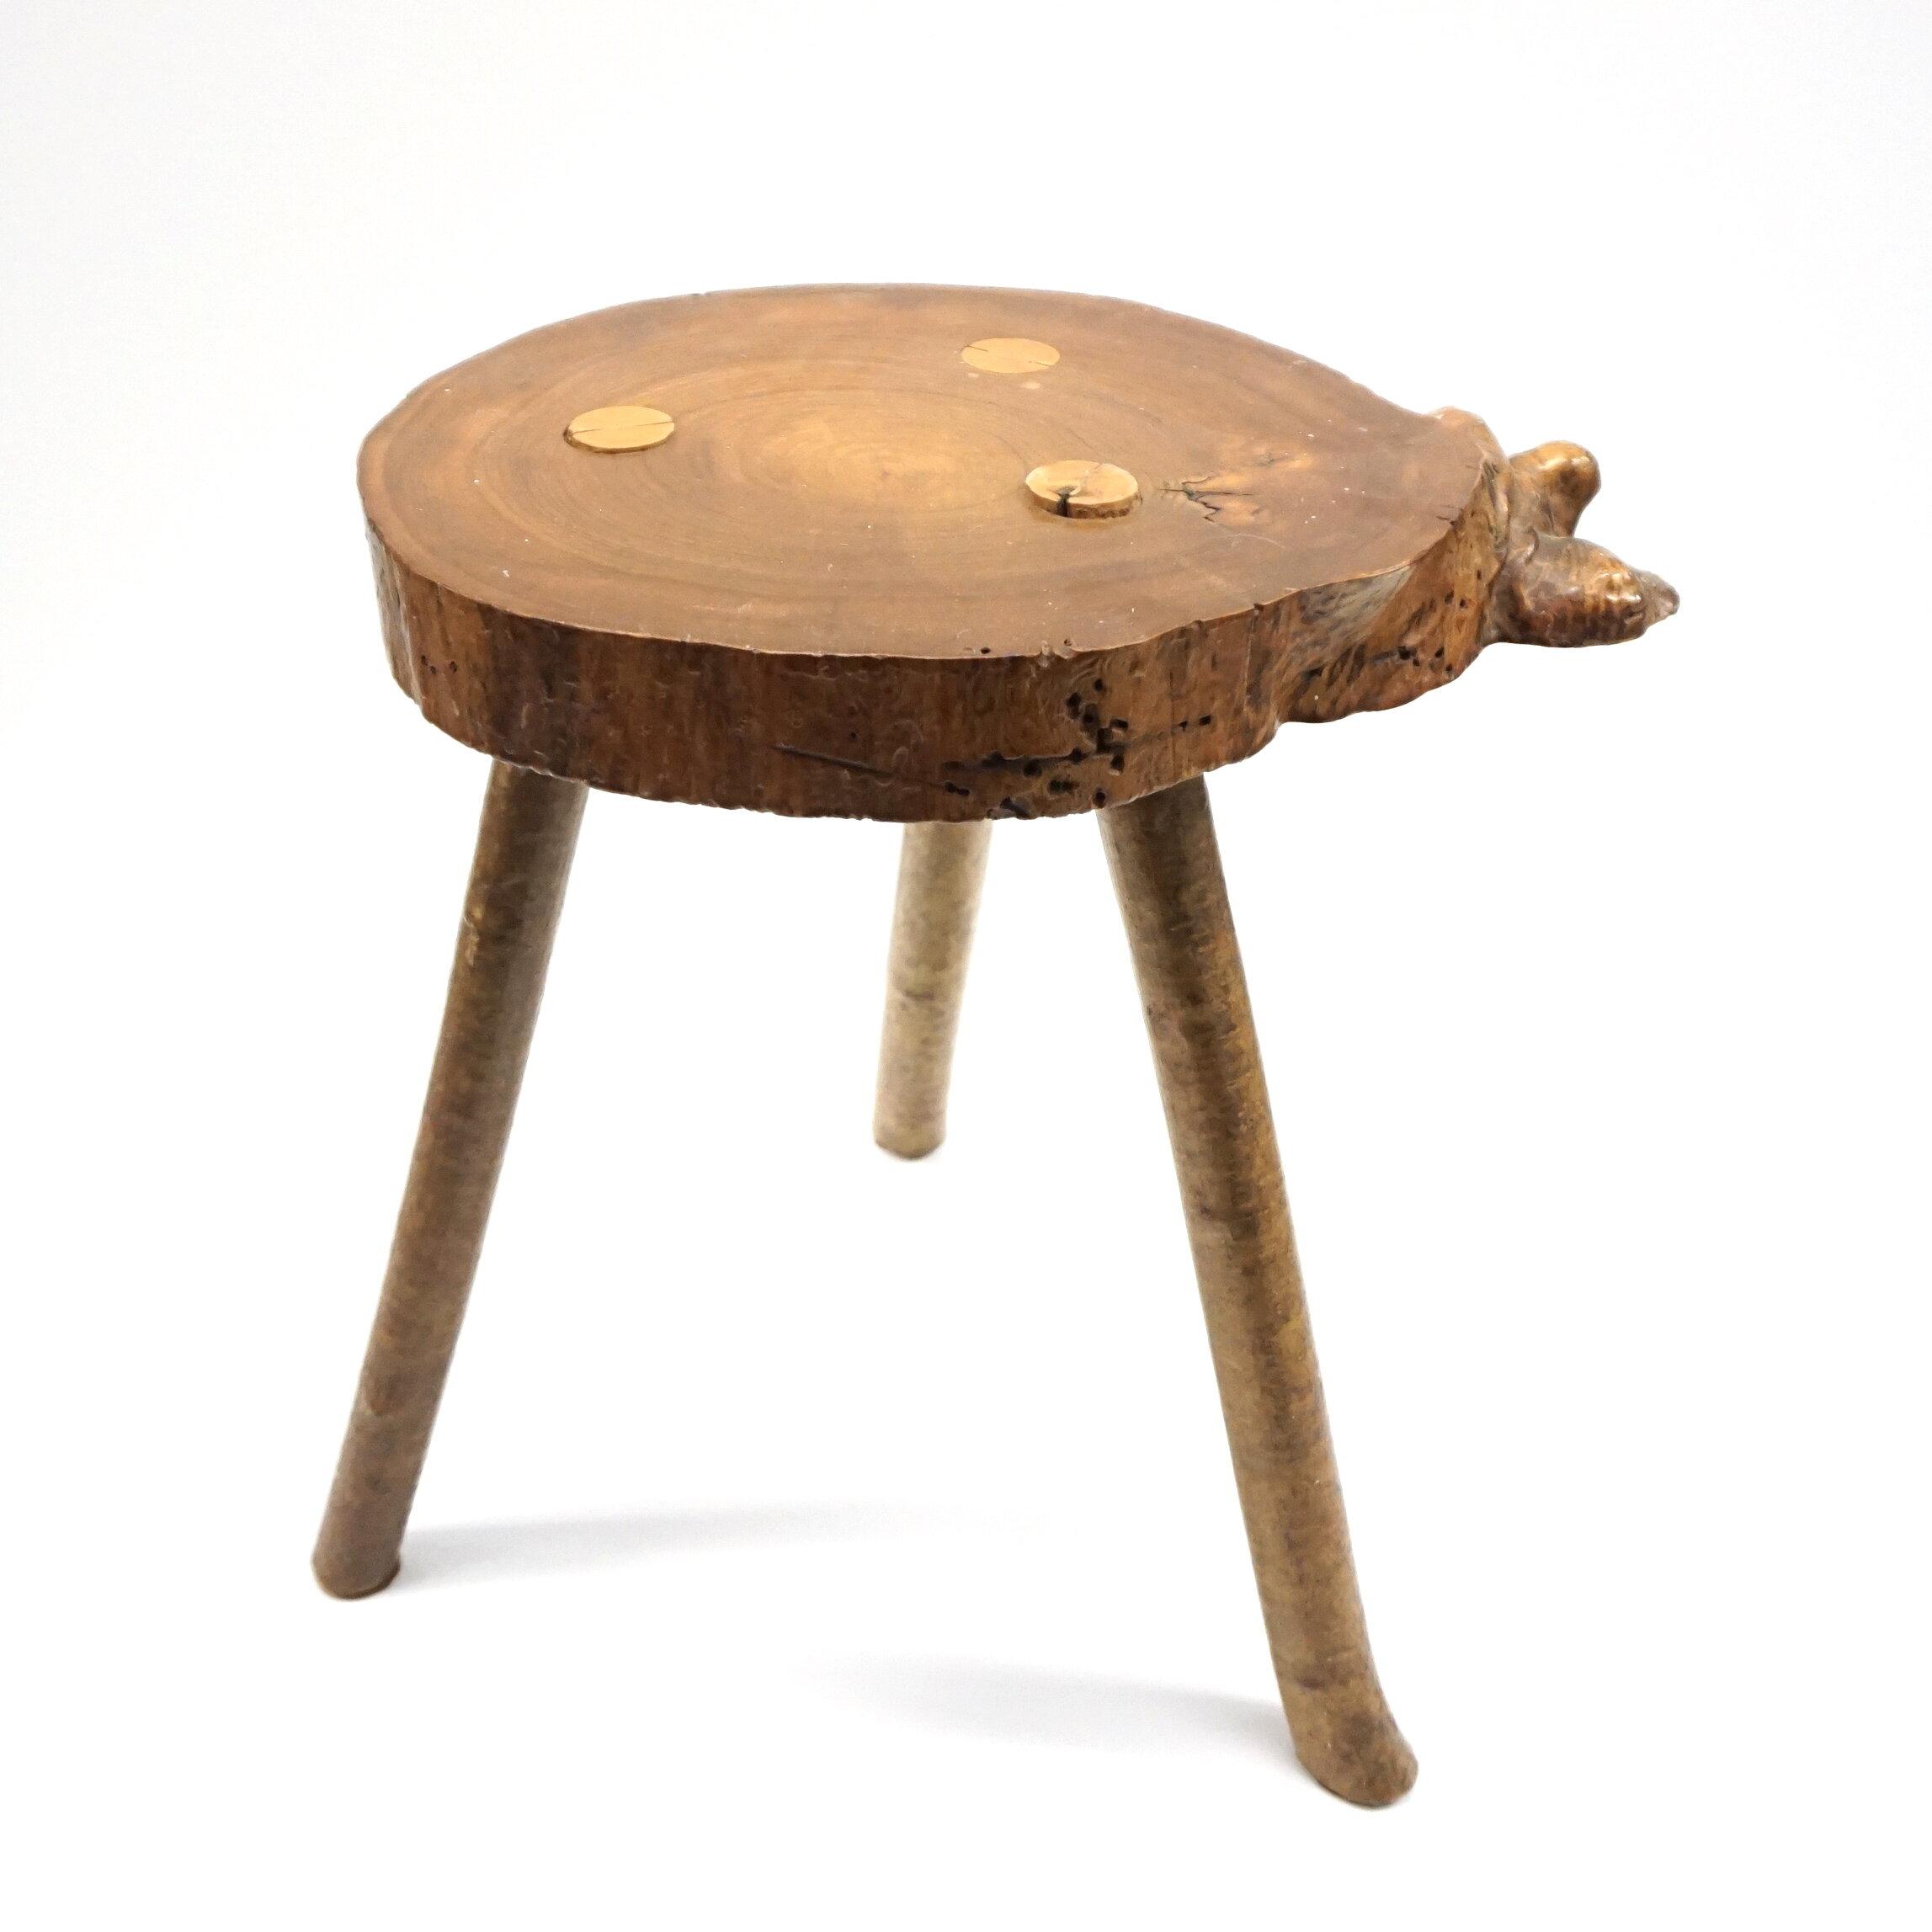 primitive wood side table audra kiewiet de jonge art interiors